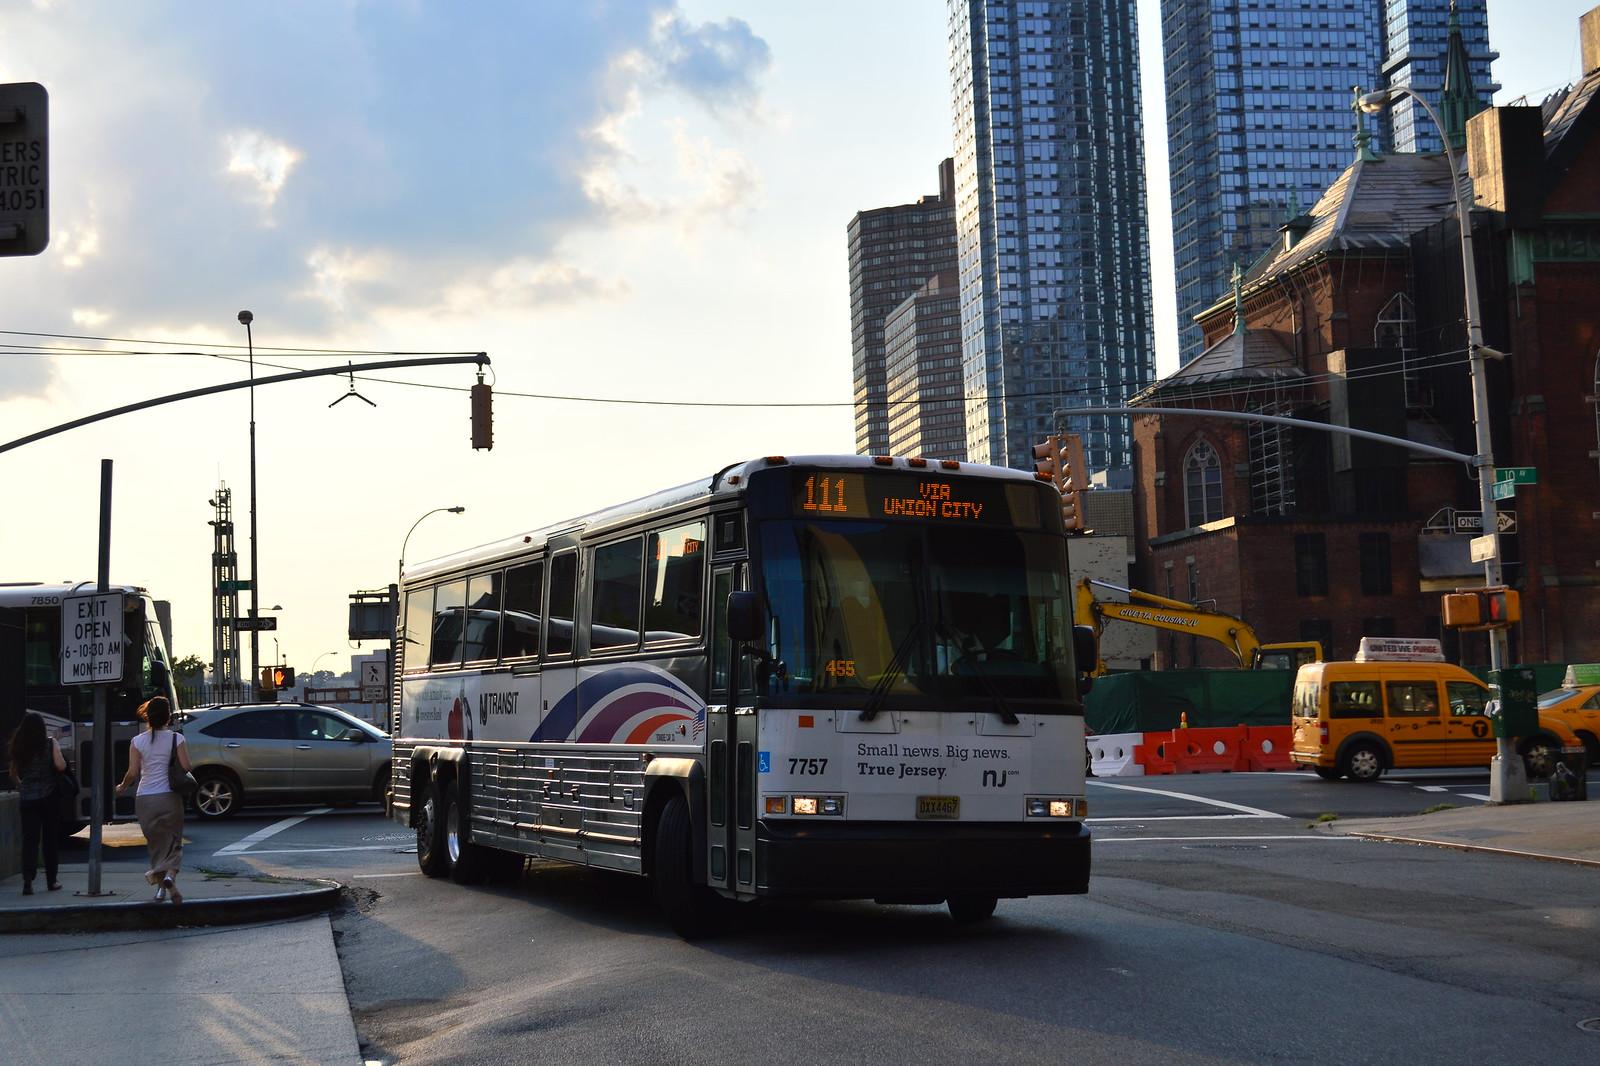 2015 mci d4500ct cng 7278 others nj transit photos videos nyc transit forums. Black Bedroom Furniture Sets. Home Design Ideas